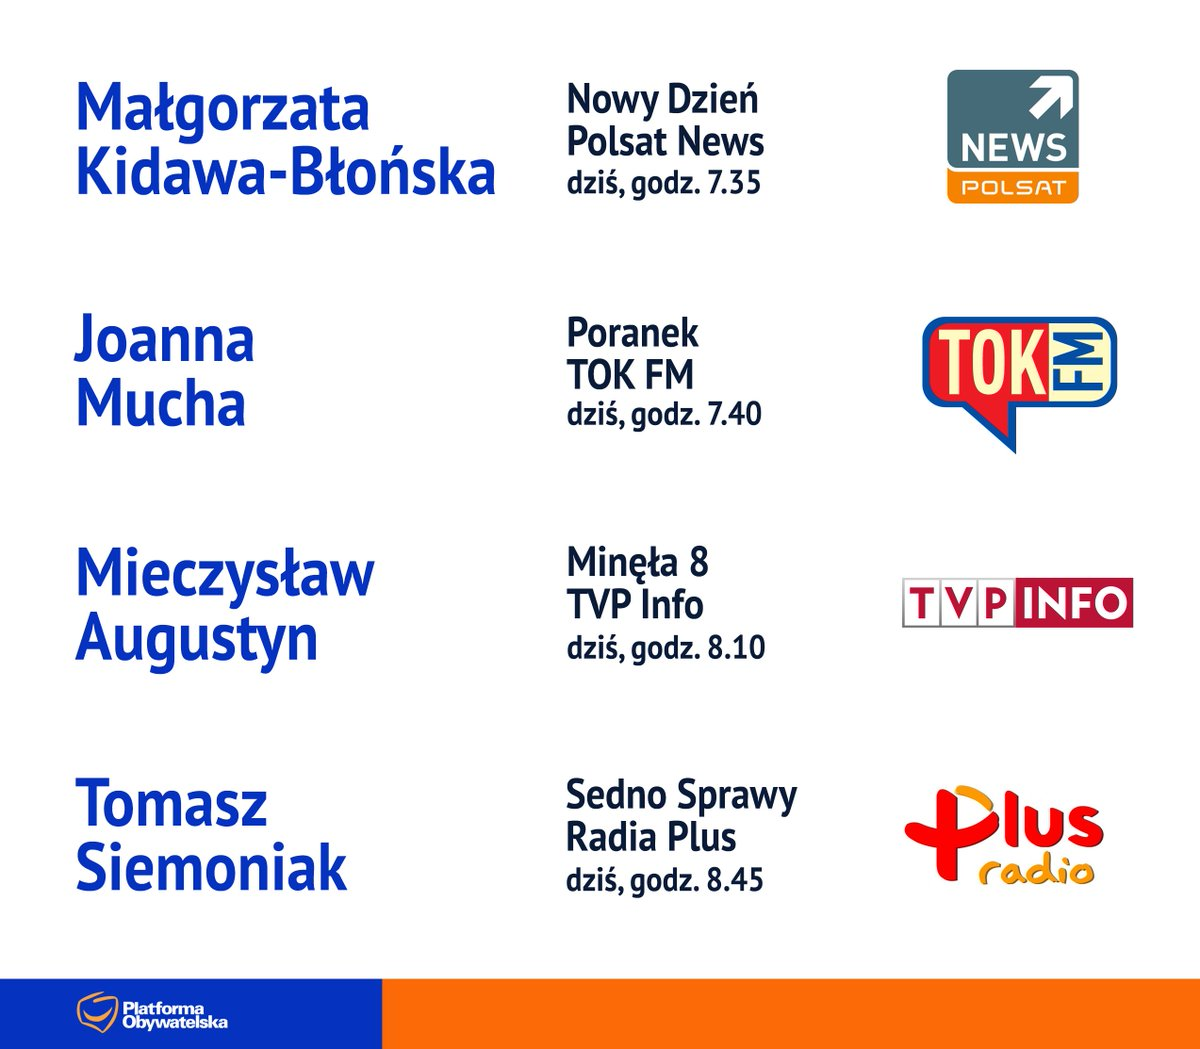 RT @NewsPlatforma: #POwMediach (18 stycznia) @M_K_Blonska @joannamucha @senatorAugustyn @TomaszSiemoniak https://t.co/HJdcpbSzF1